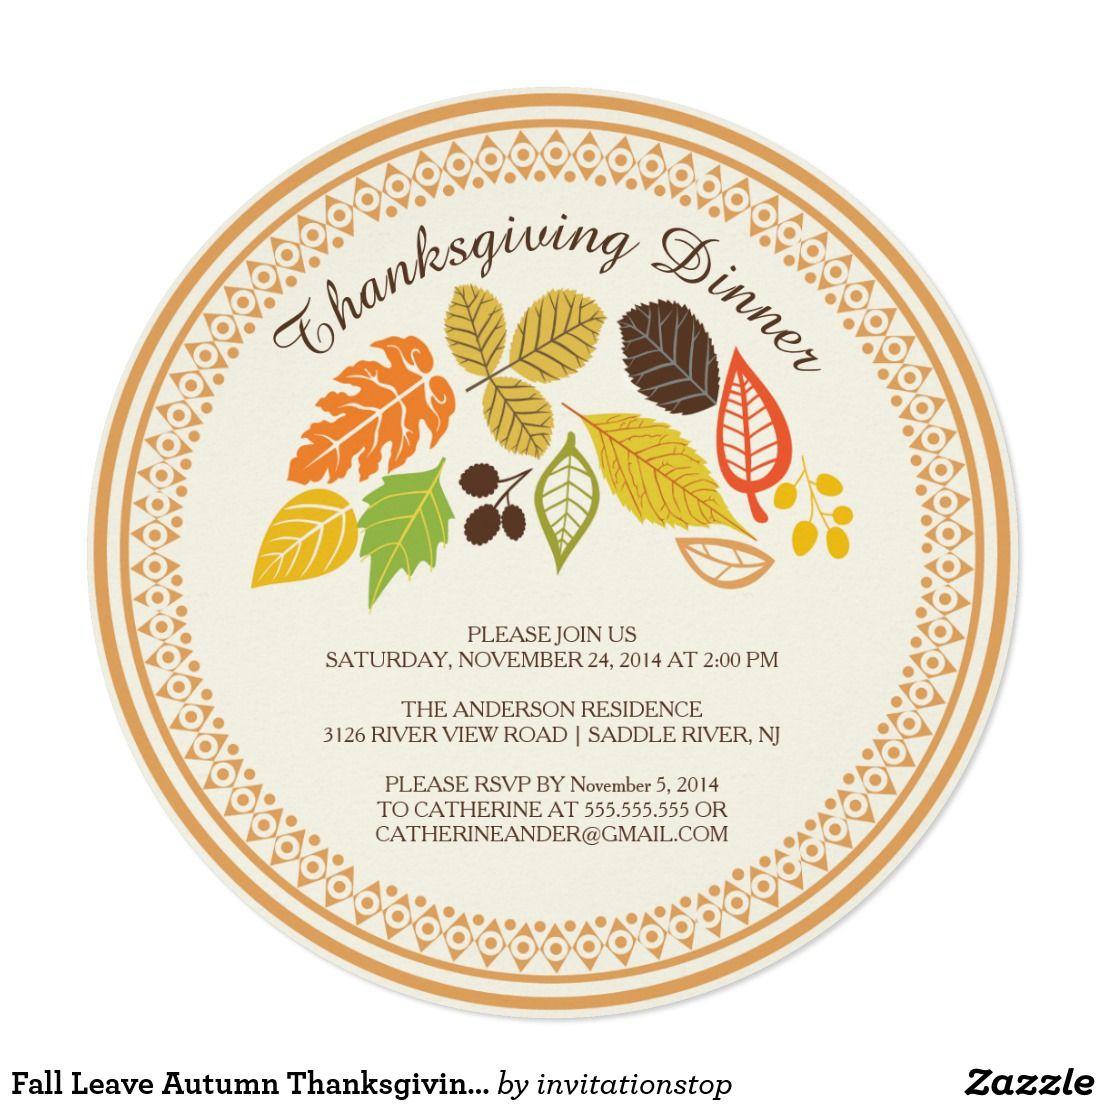 Fall Leave Autumn Thanksgiving Dinner Invitations Zazzle Com In 2020 Thanksgiving Dinner Invitation Fall Bridal Shower Invites Dinner Invitations